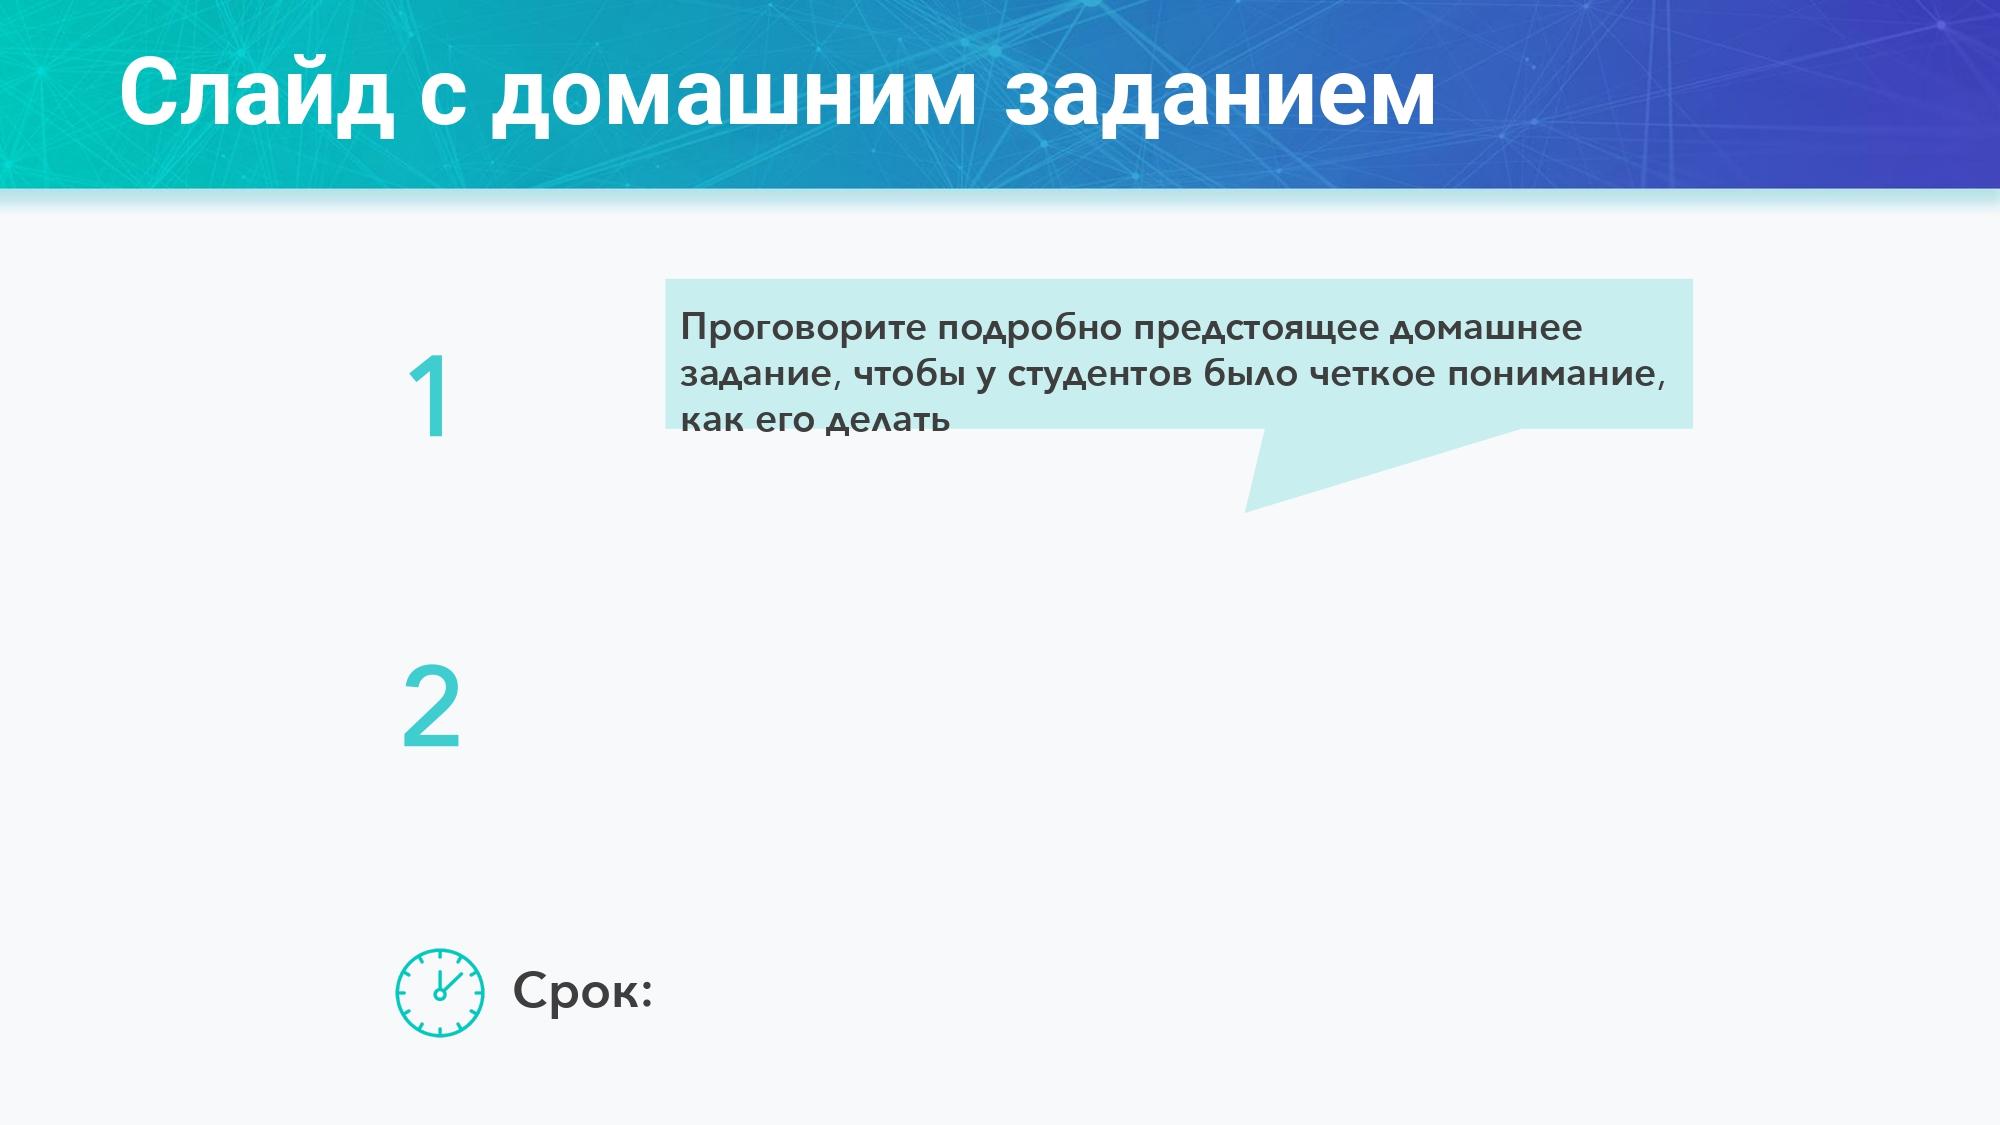 Шаблон_презентации_вебинара_в_новом_дизайне_с_подсказками_page_0011-73510-c5583c.jpg